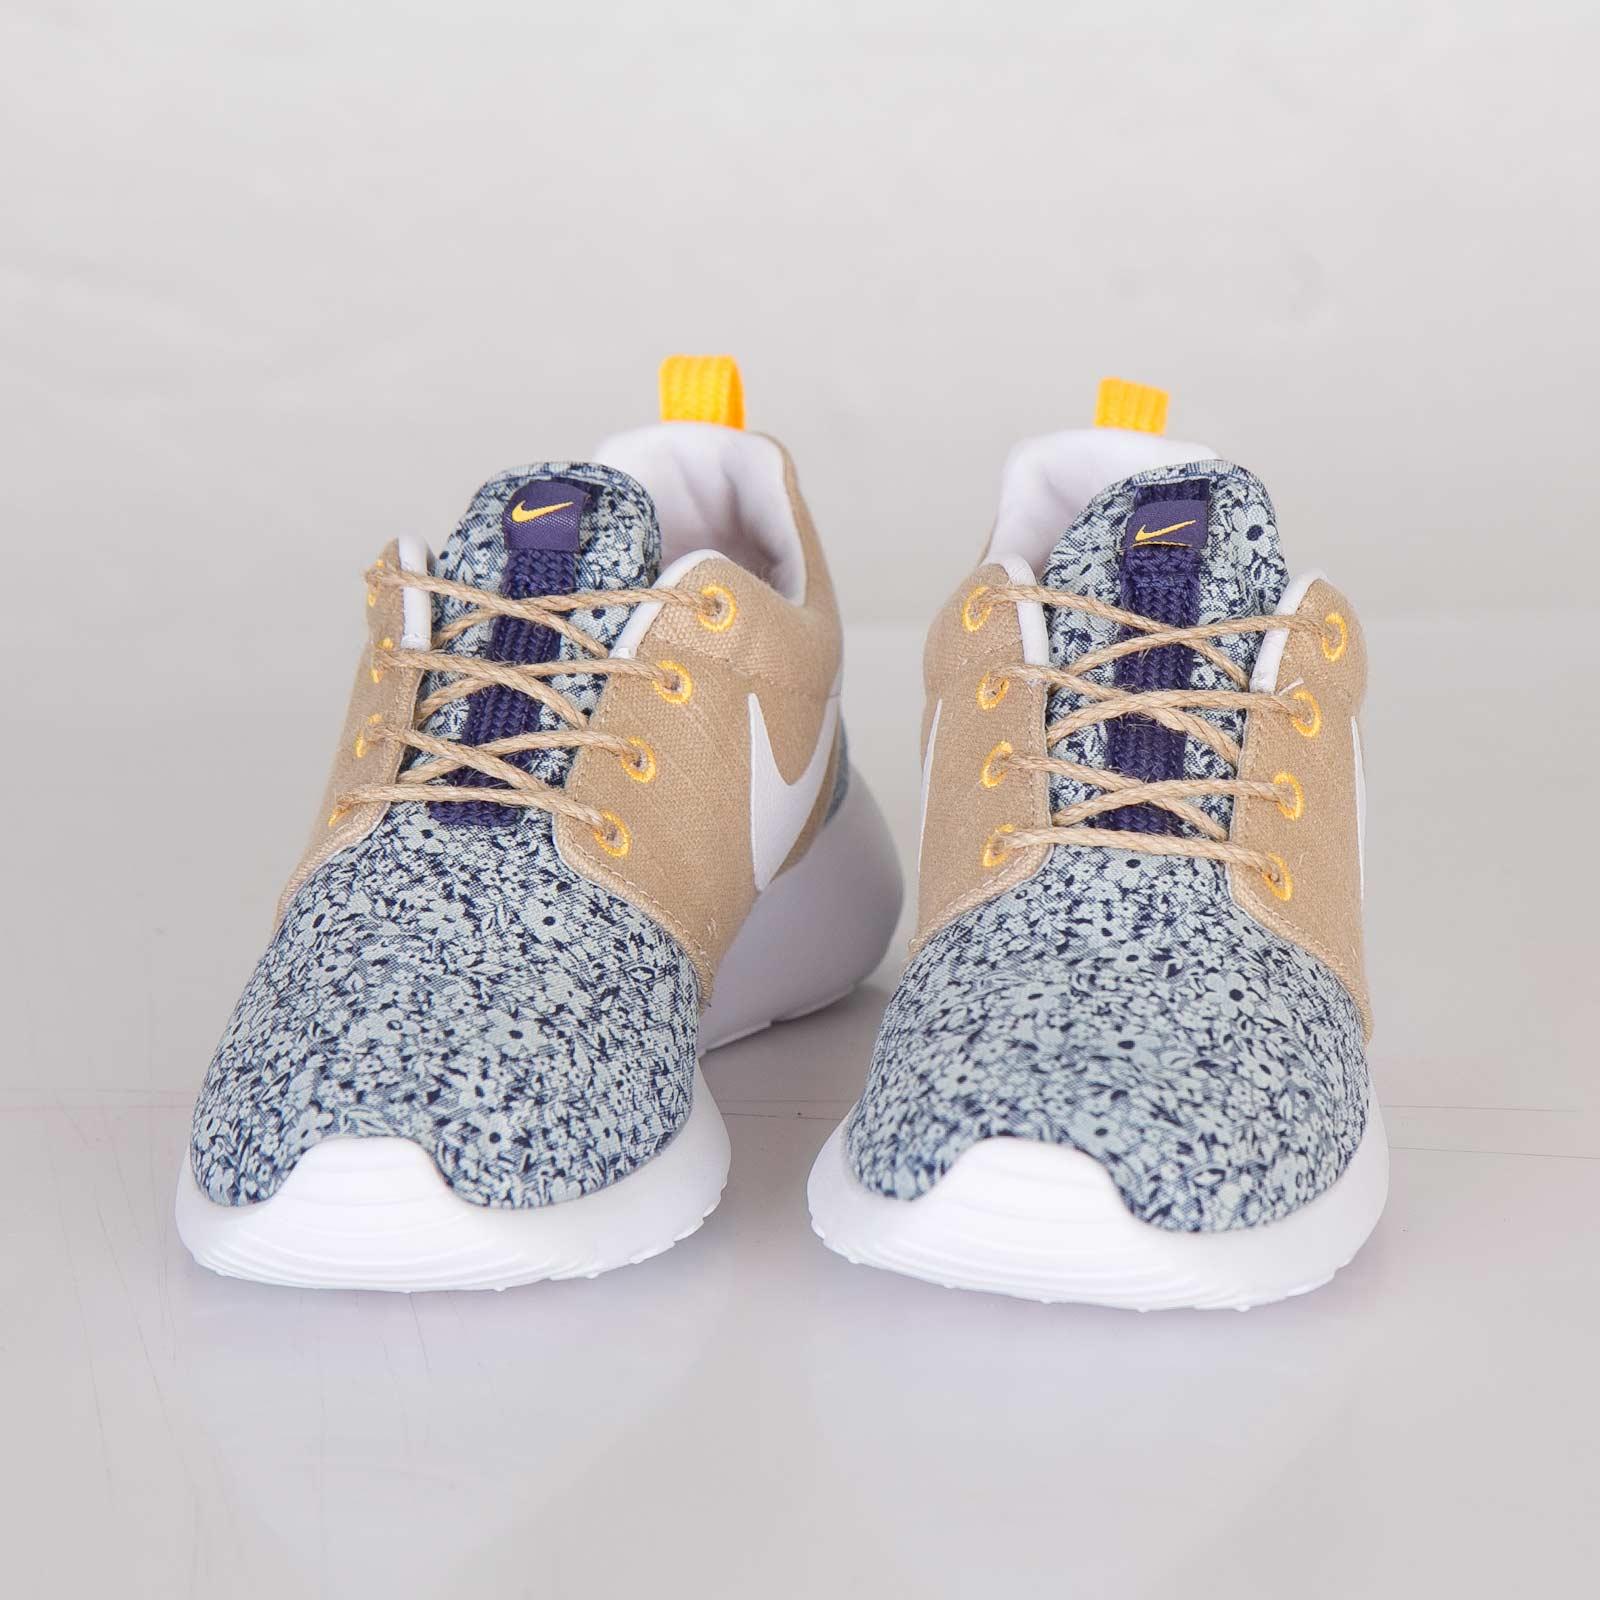 huge selection of c5034 43c6d Nike Wmns Roshe Run Liberty QS - 654165-400 - Sneakersnstuff   sneakers    streetwear online since 1999